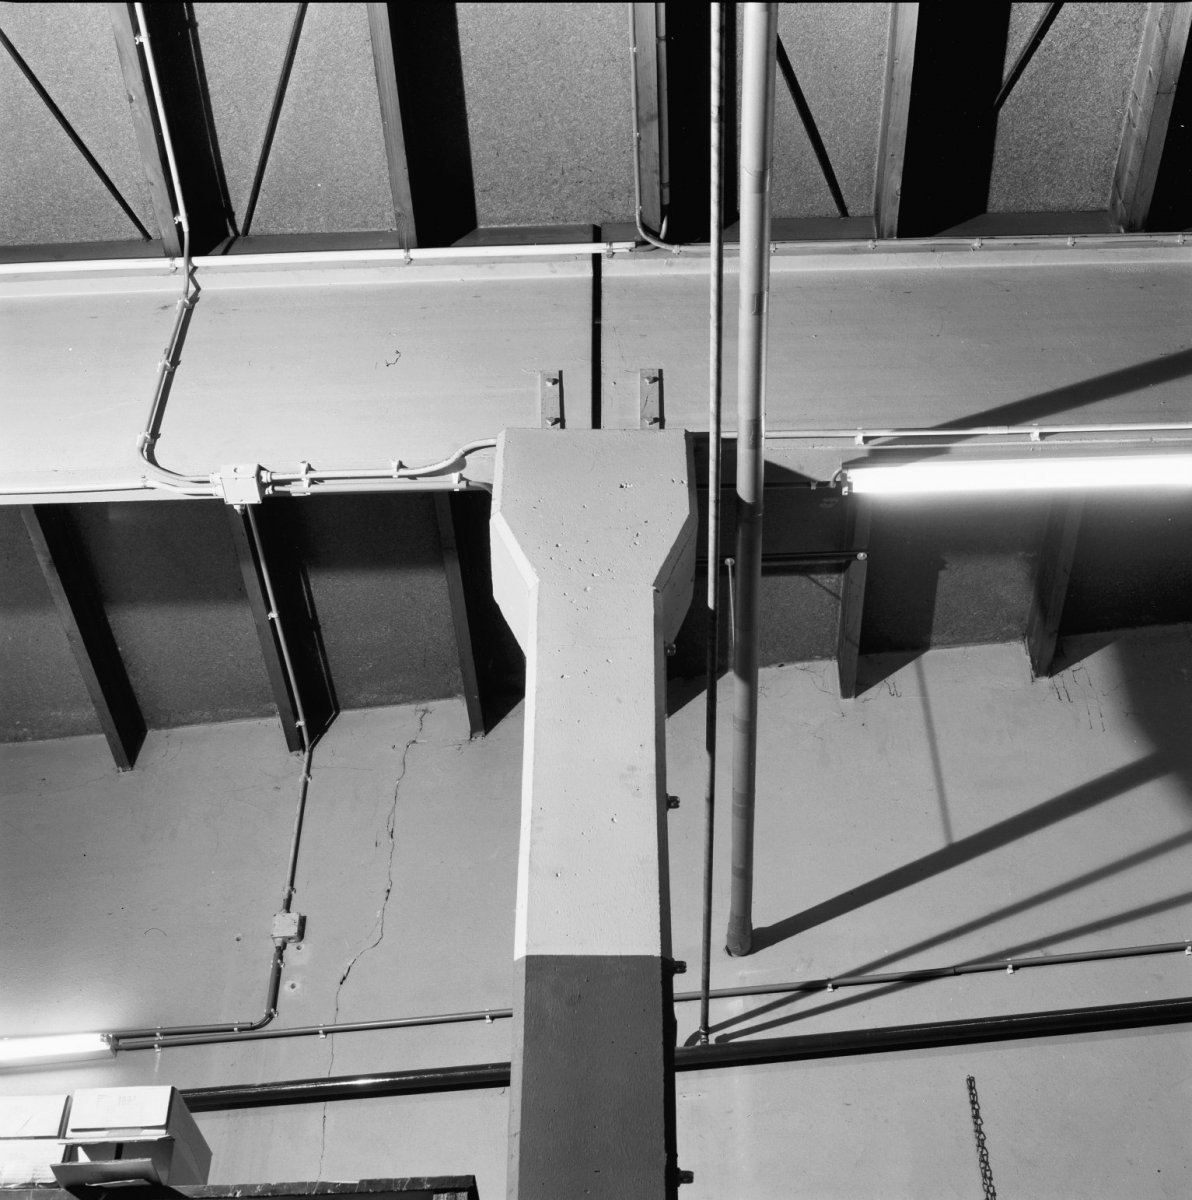 file interieur kolom beton detail almelo 20284932 wikimedia commons. Black Bedroom Furniture Sets. Home Design Ideas